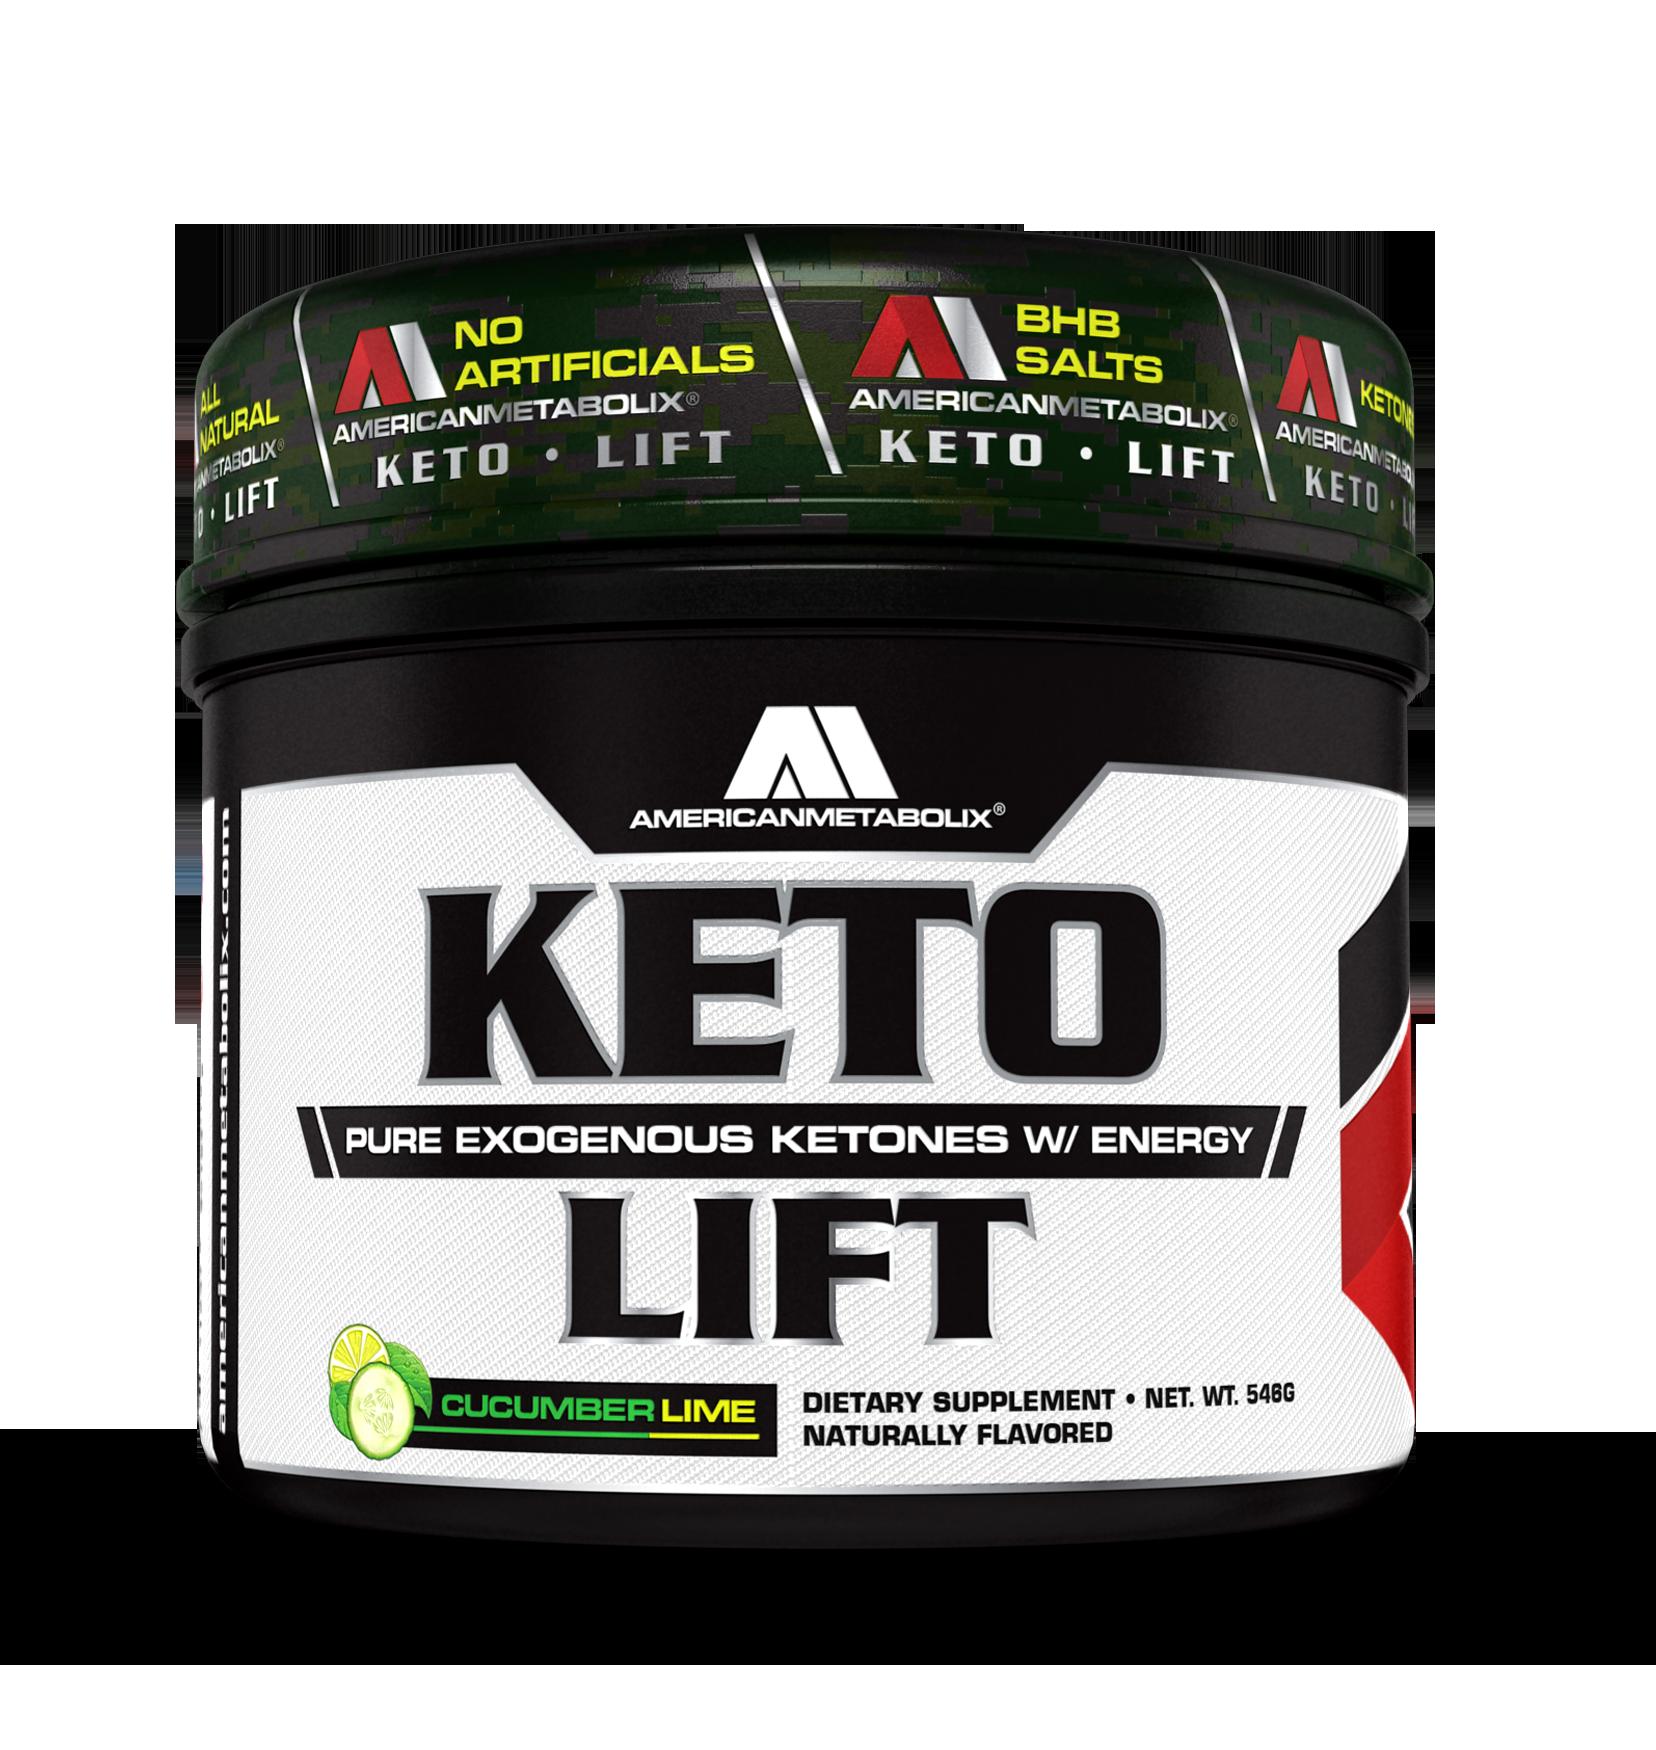 american-metobolics-american-metobolics-keto lift -cucumber lime